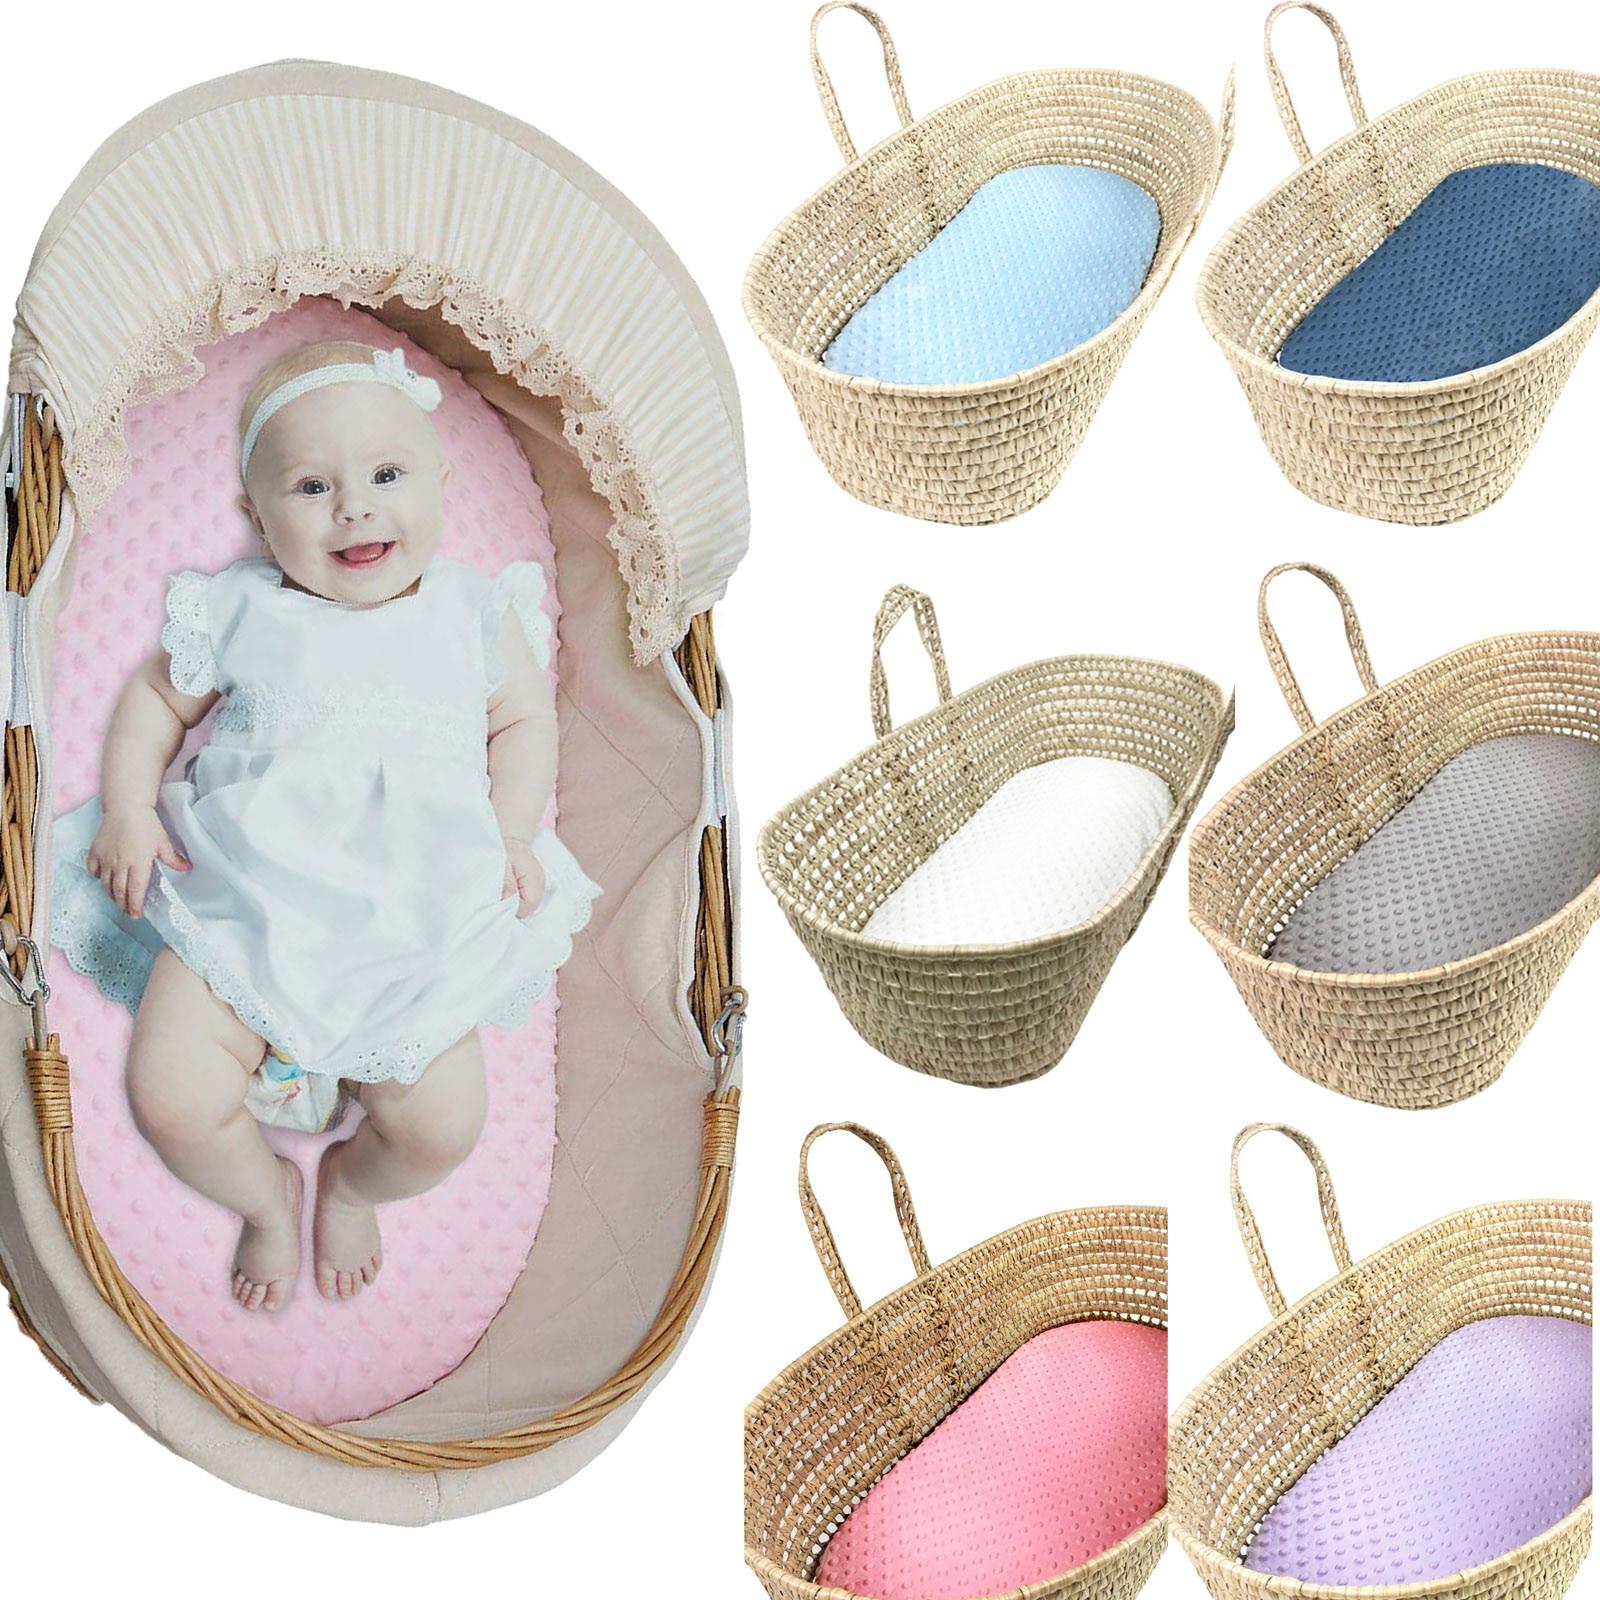 Infants Boys Girls Cradle beds Baby Moses Basket Super Soft Bubble Bed Baby Crib Care Pad Covers Fitted Sheet для новорожденных